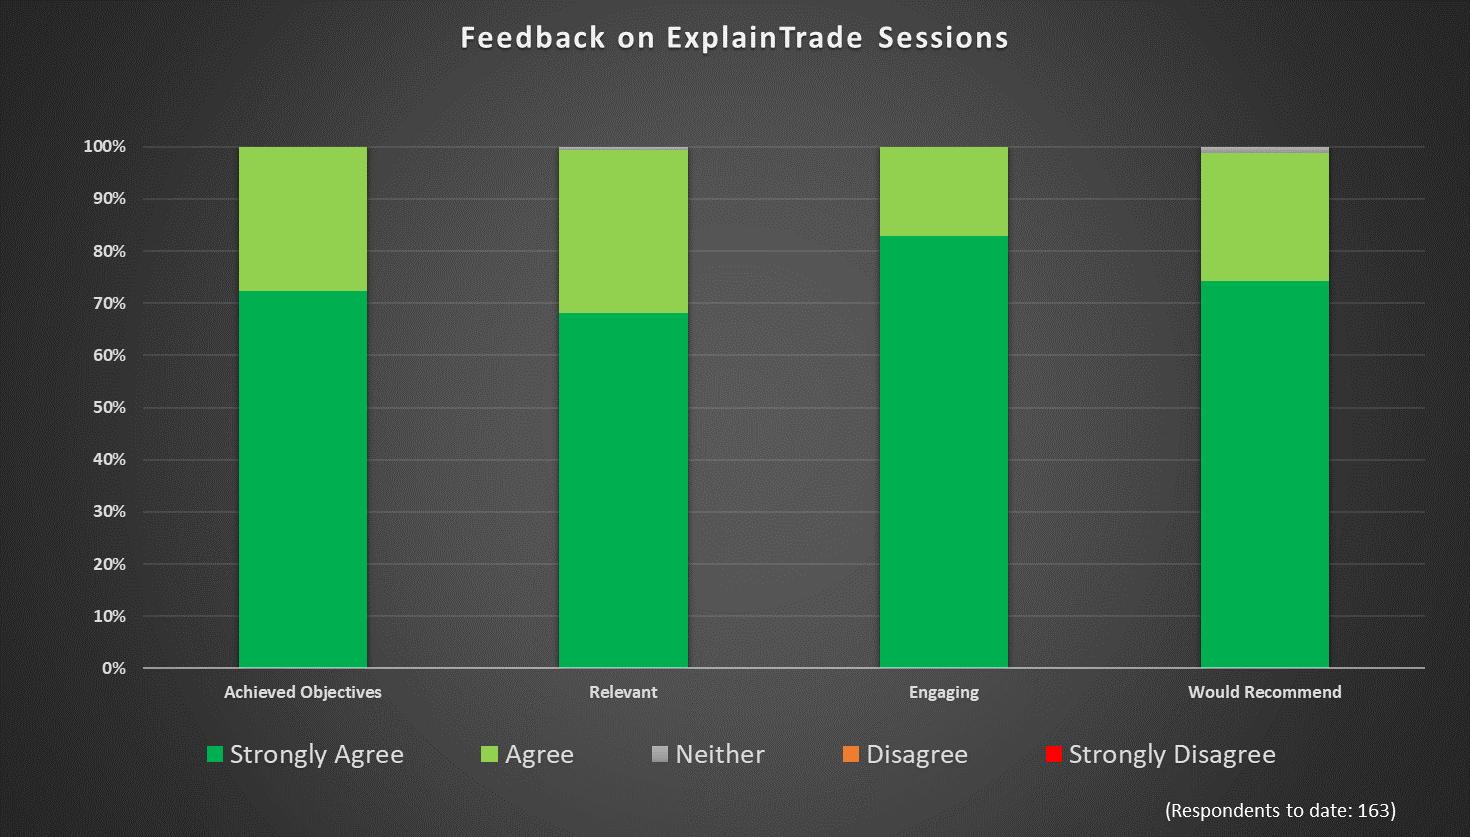 ExplainTrade aggregate quantitative results, as at June 11 2019.